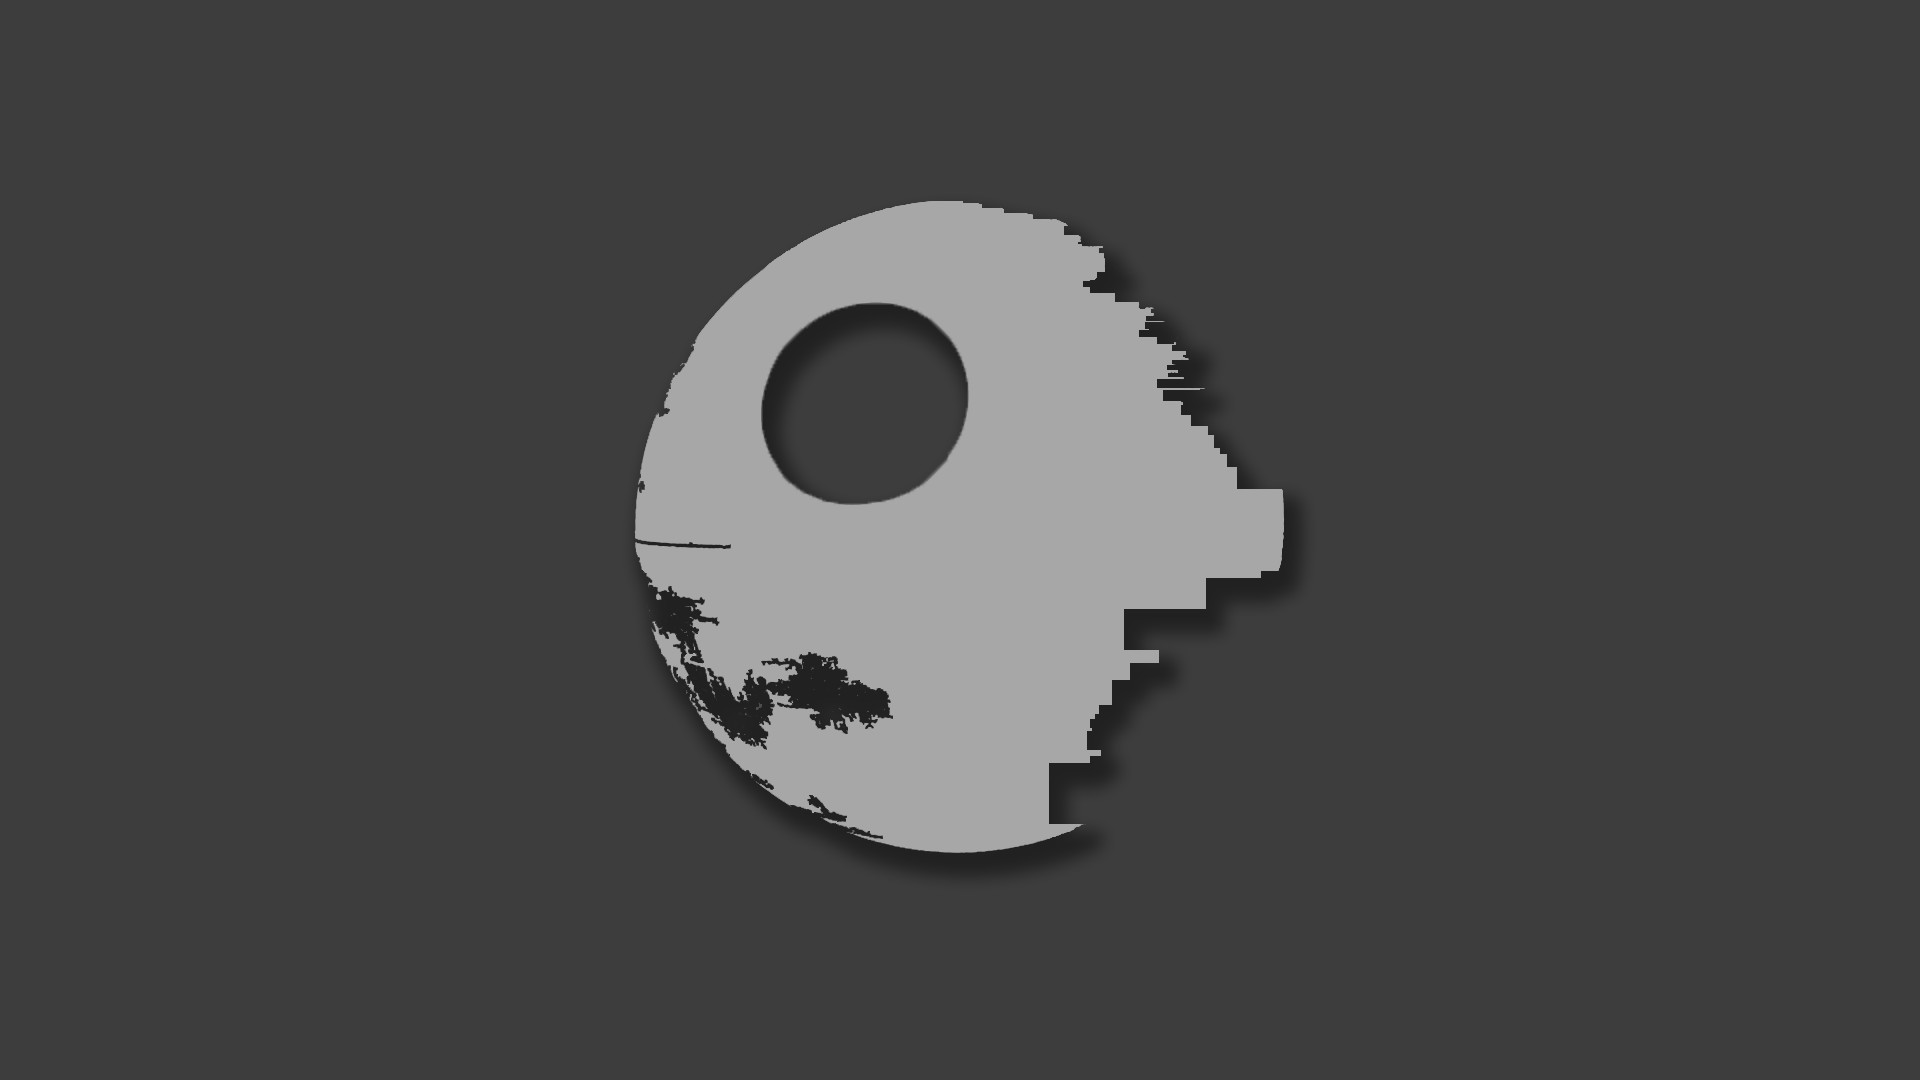 Death Star Background 70 images